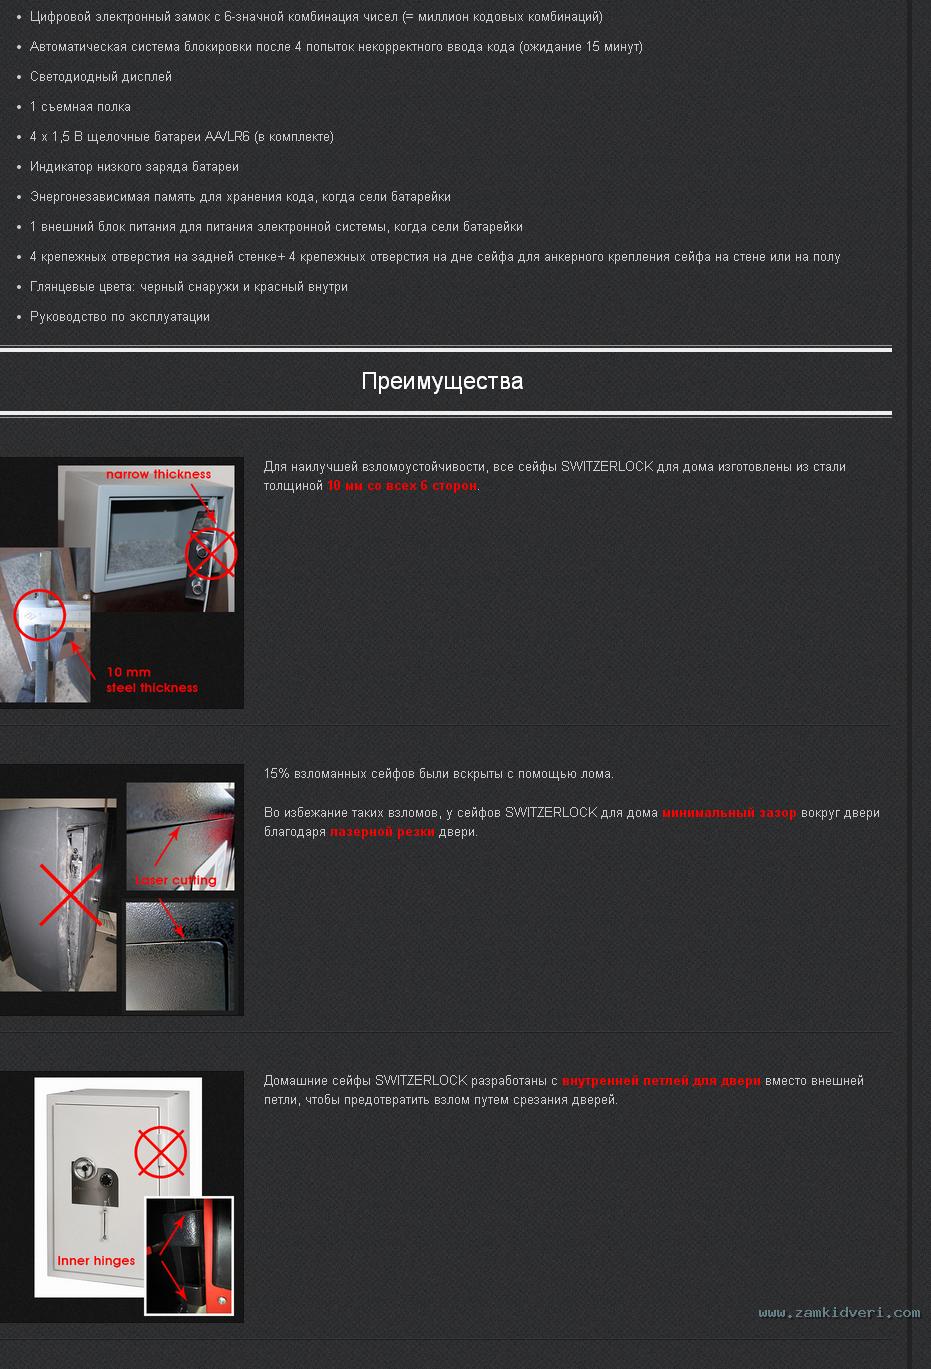 Нажмите на изображение для увеличения Название: Скриншот 2014-01-20 20.11.25.png Просмотров: 0 Размер:582.8 Кб ID:32434